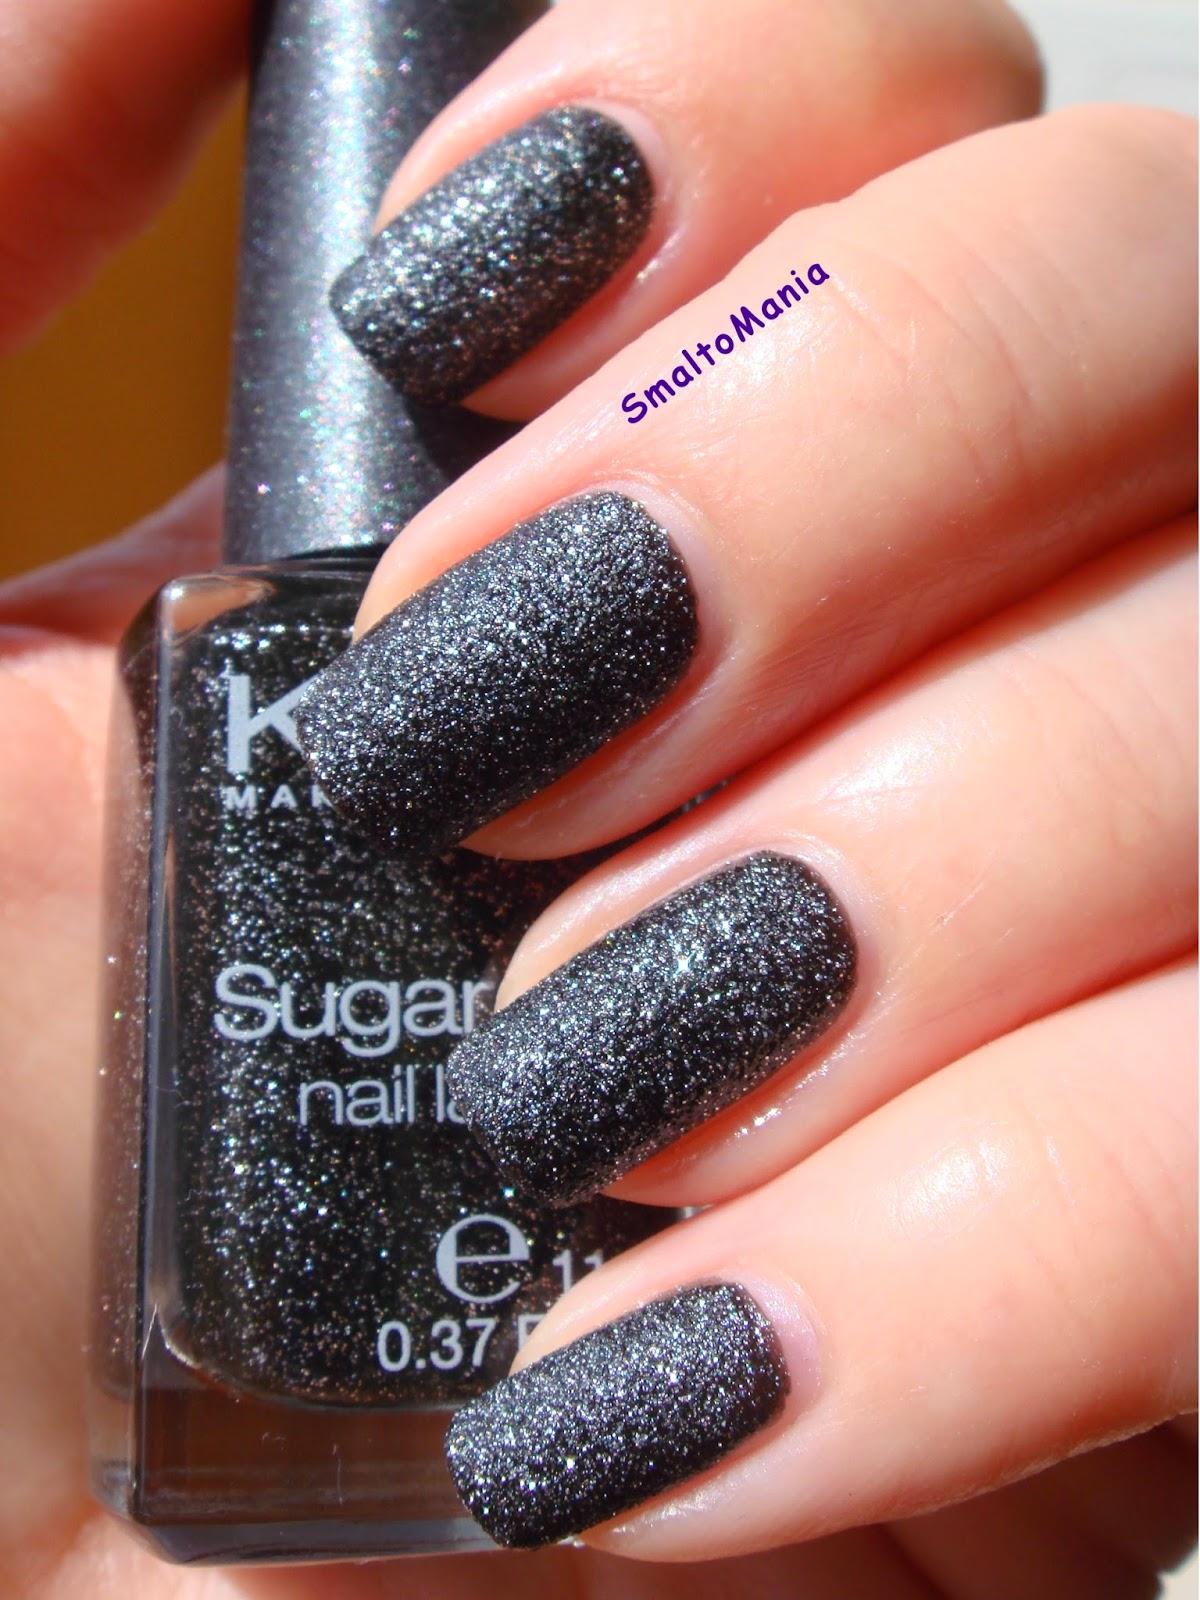 Kiko Sugar Mat n.646 Nero Stellato